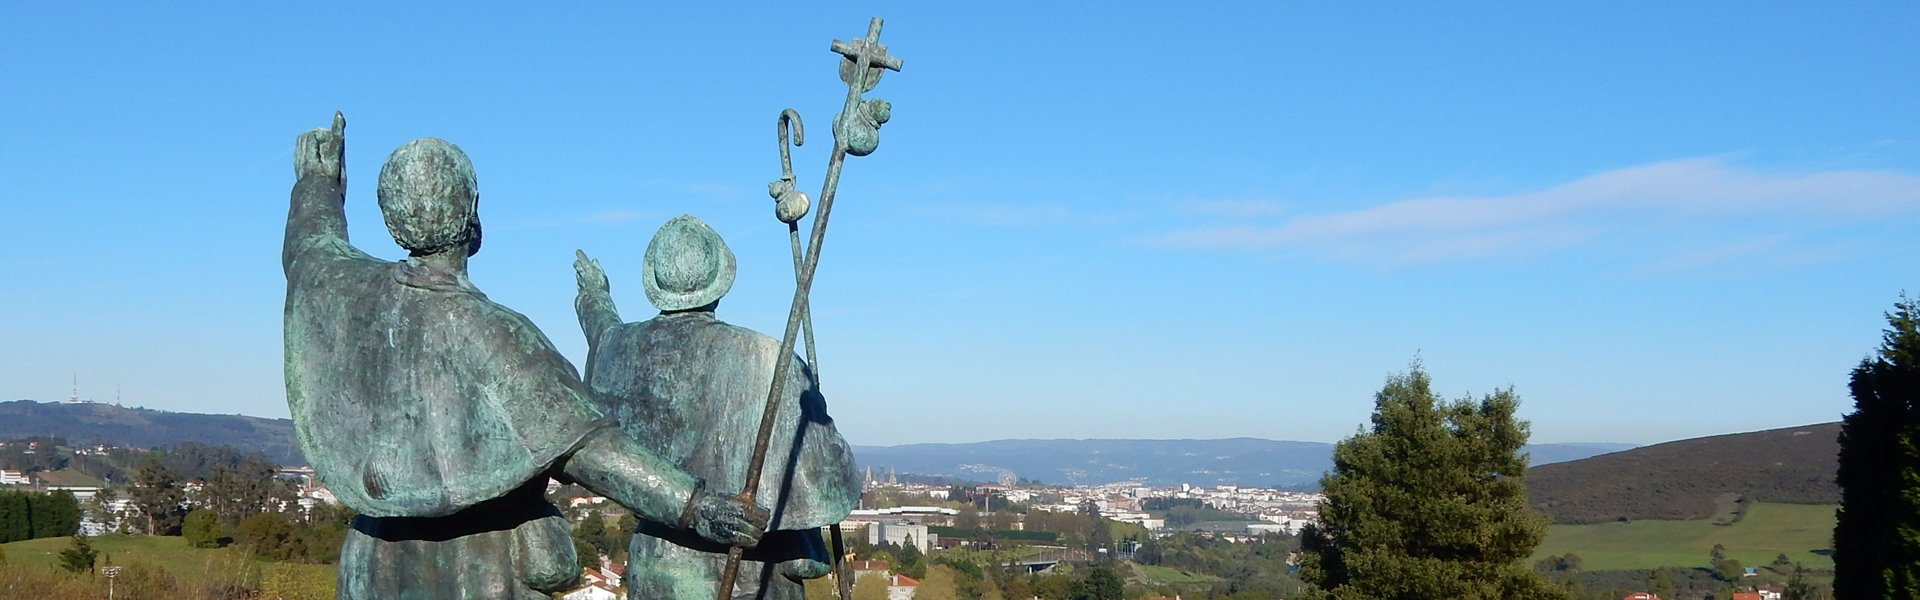 Pelgrimsroute Compostela, Spanje